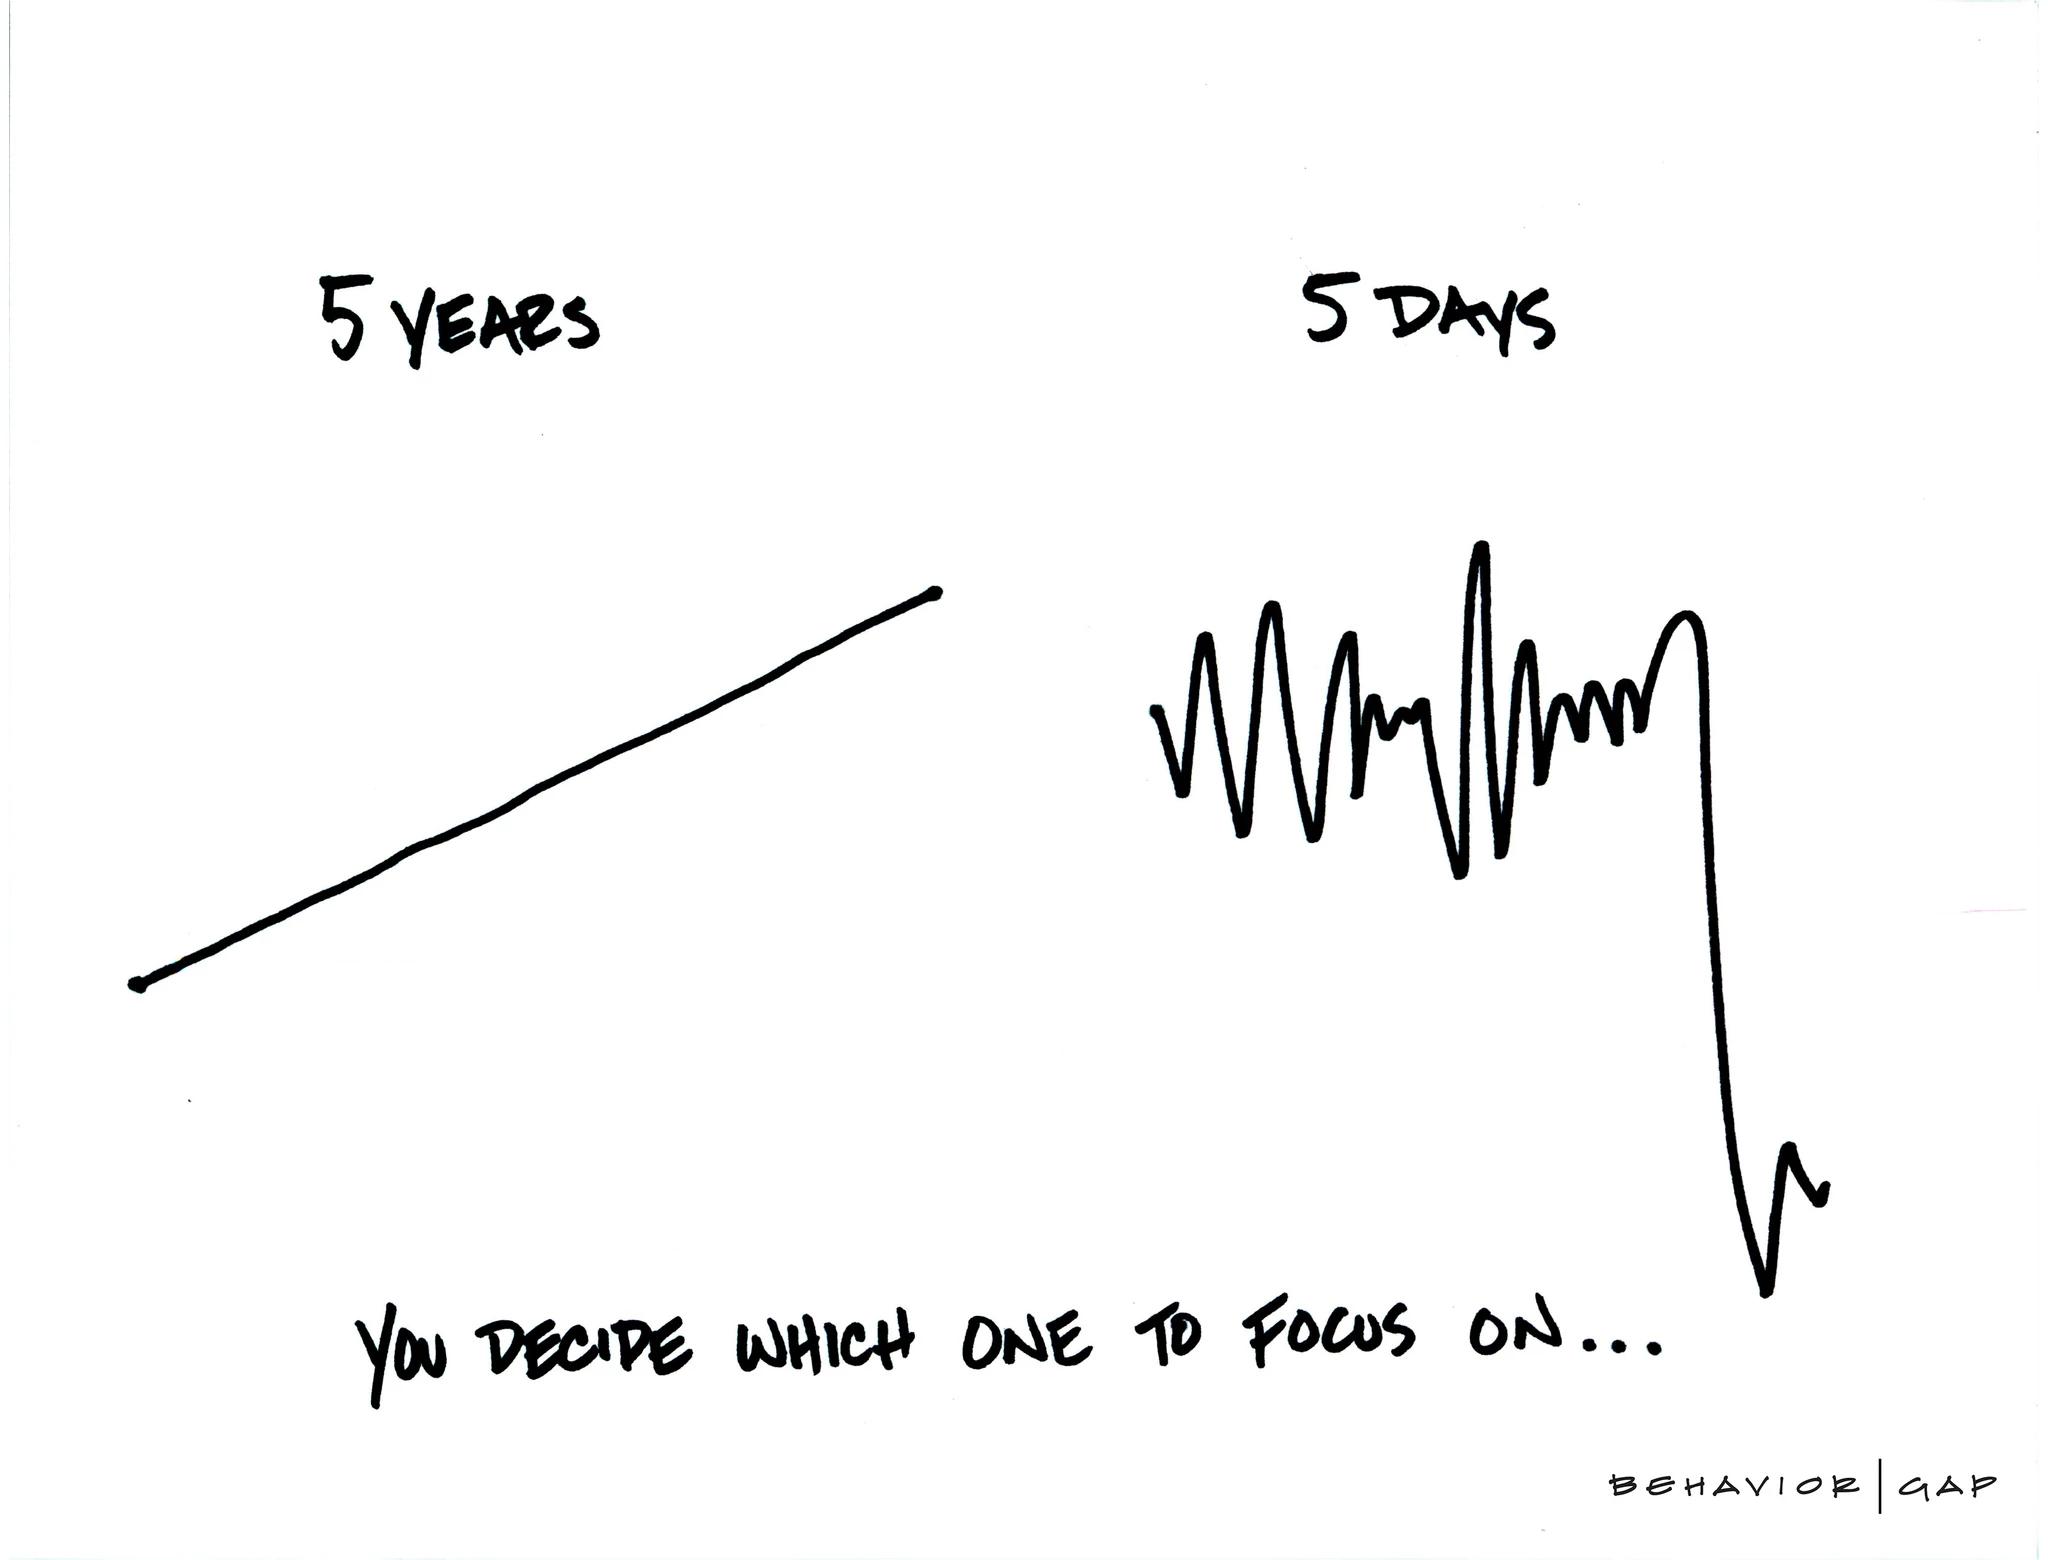 Stock market focus image